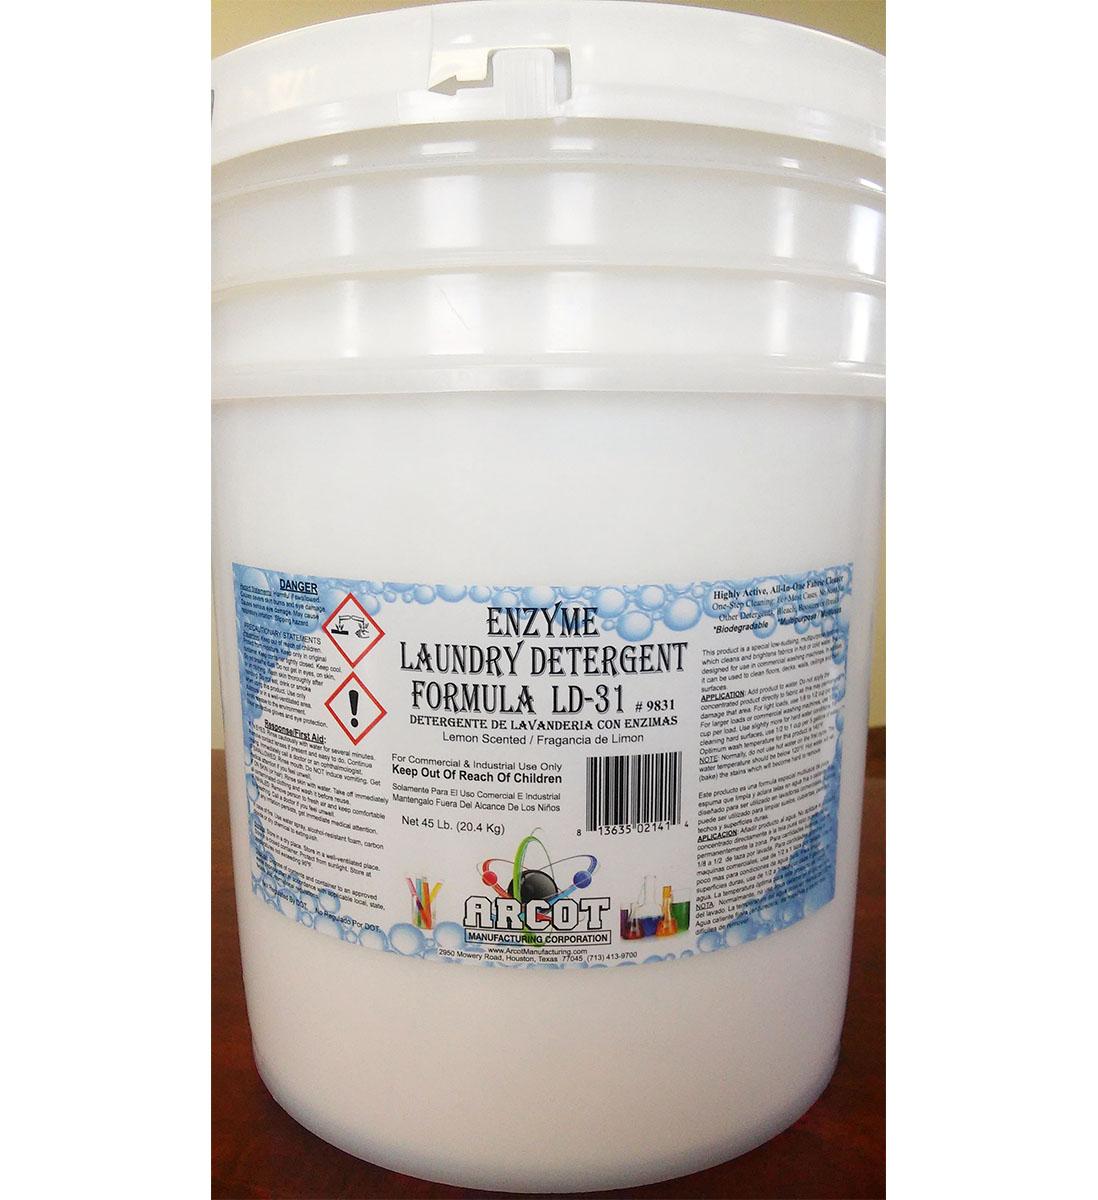 Enzyme Laundry Detergent Formula LD-31 1